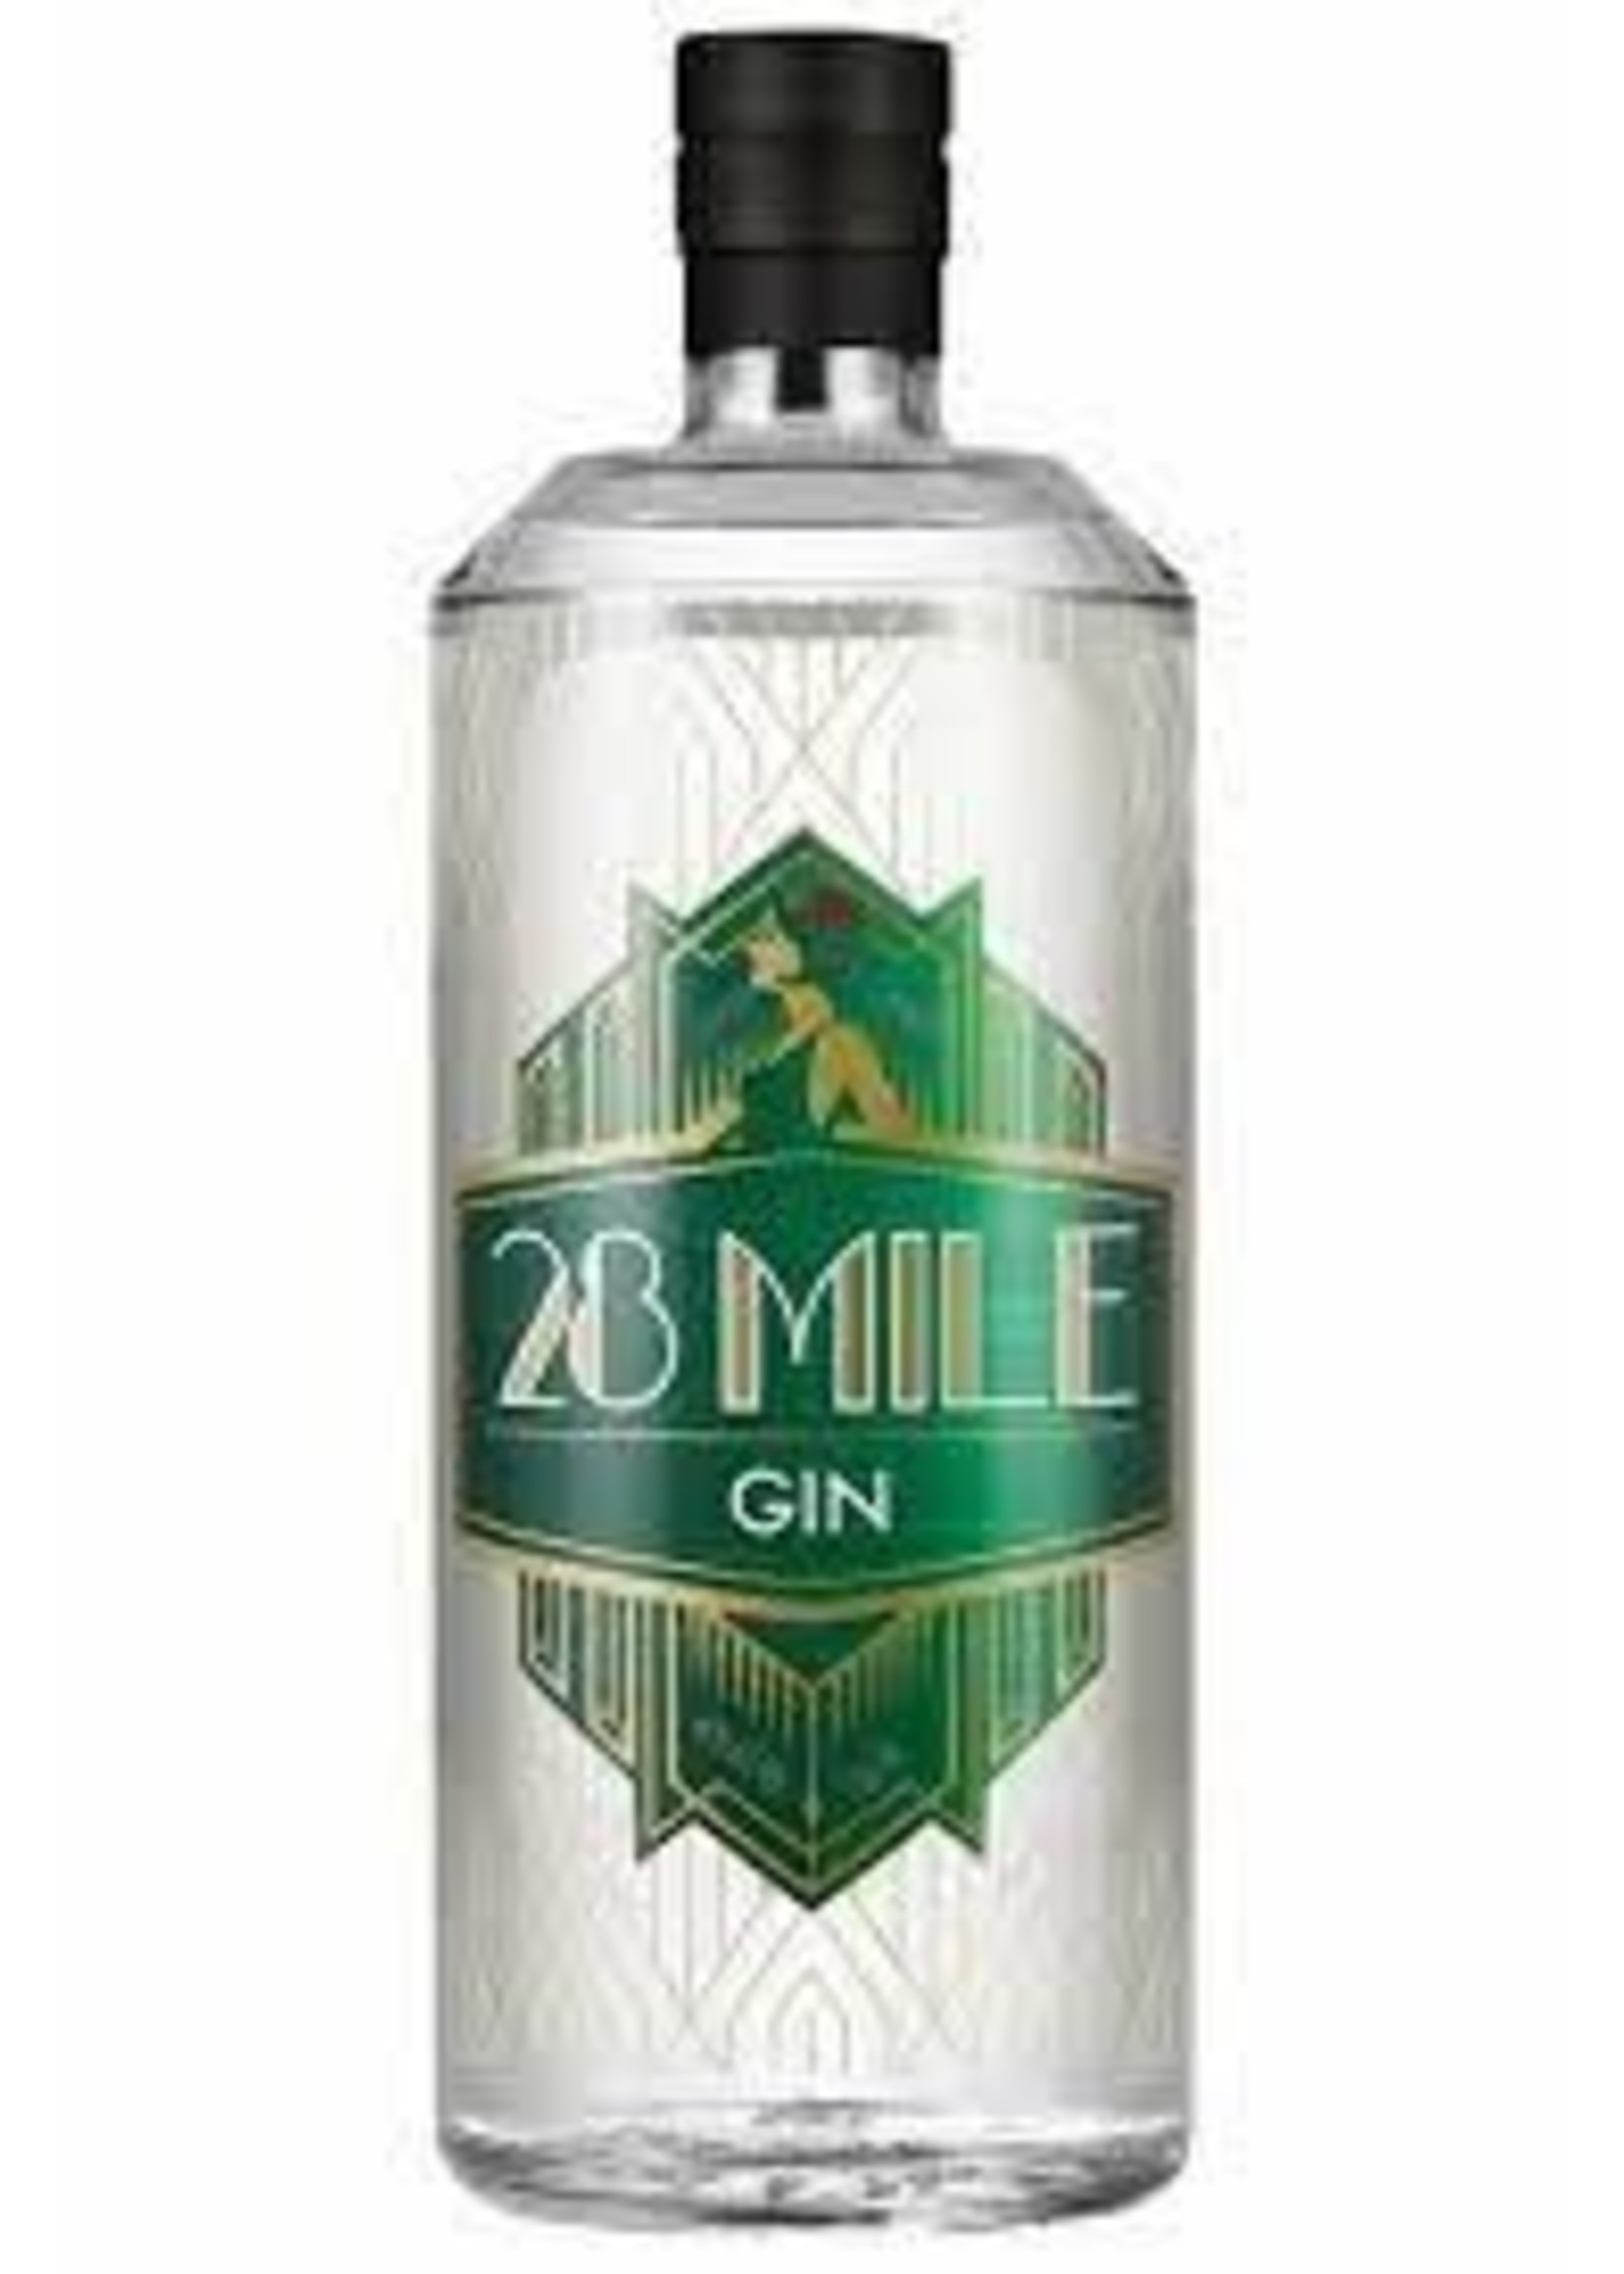 28 Mile Gin 750ml